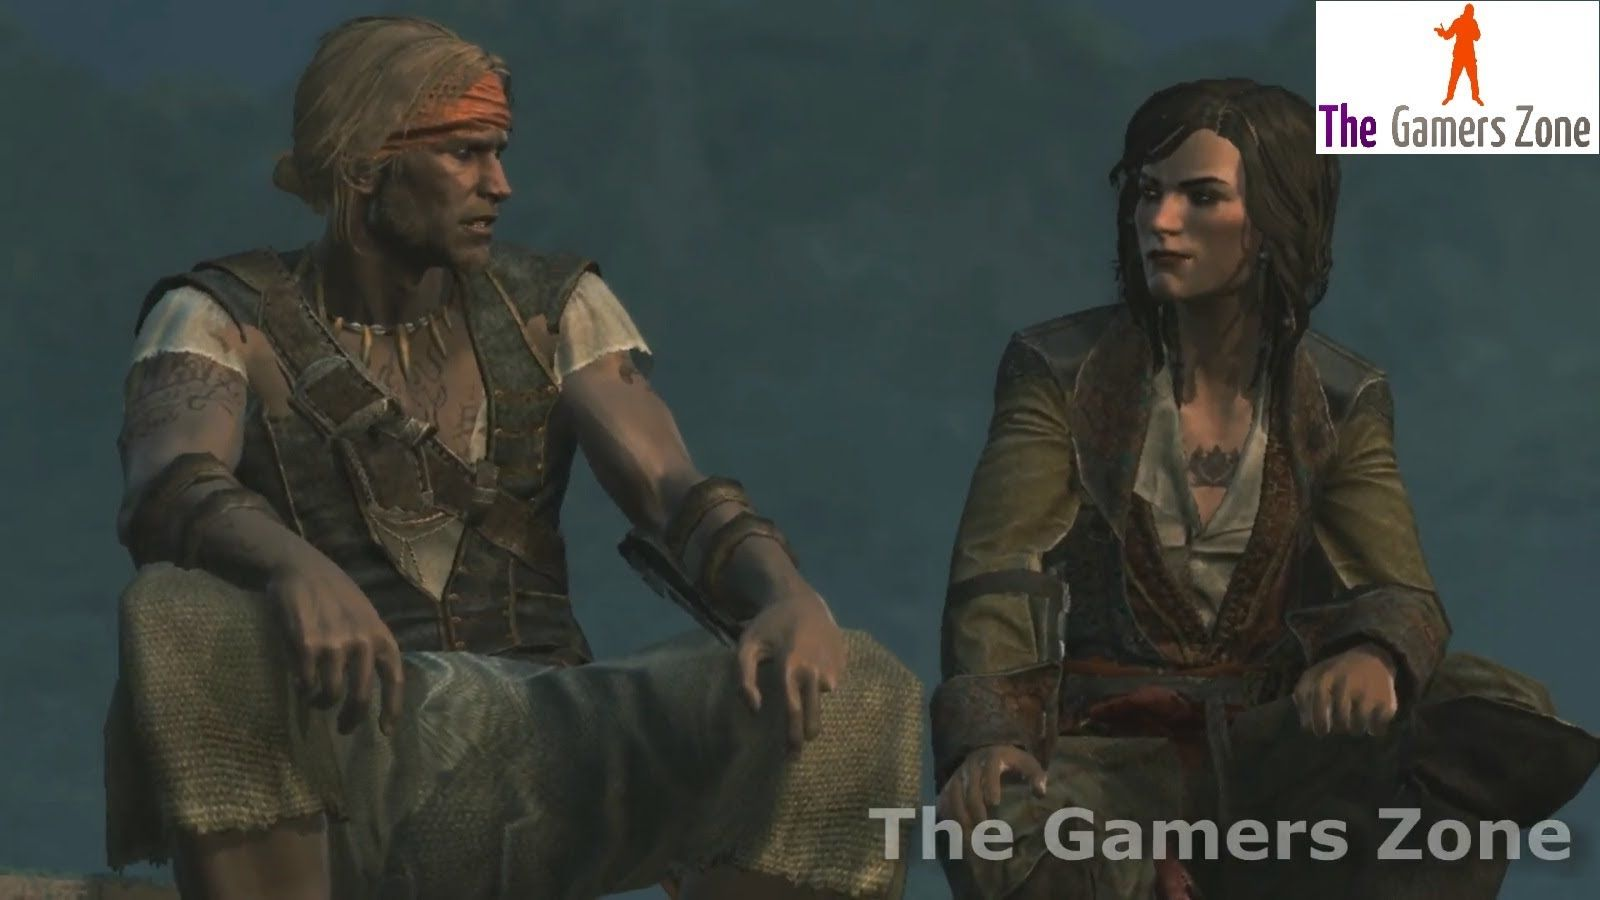 Assassin S Creed 4 Black Flag Walkthrough Sequence 05 Memory 03 Unmanned Assassins Creed 4 Black Flag Creed